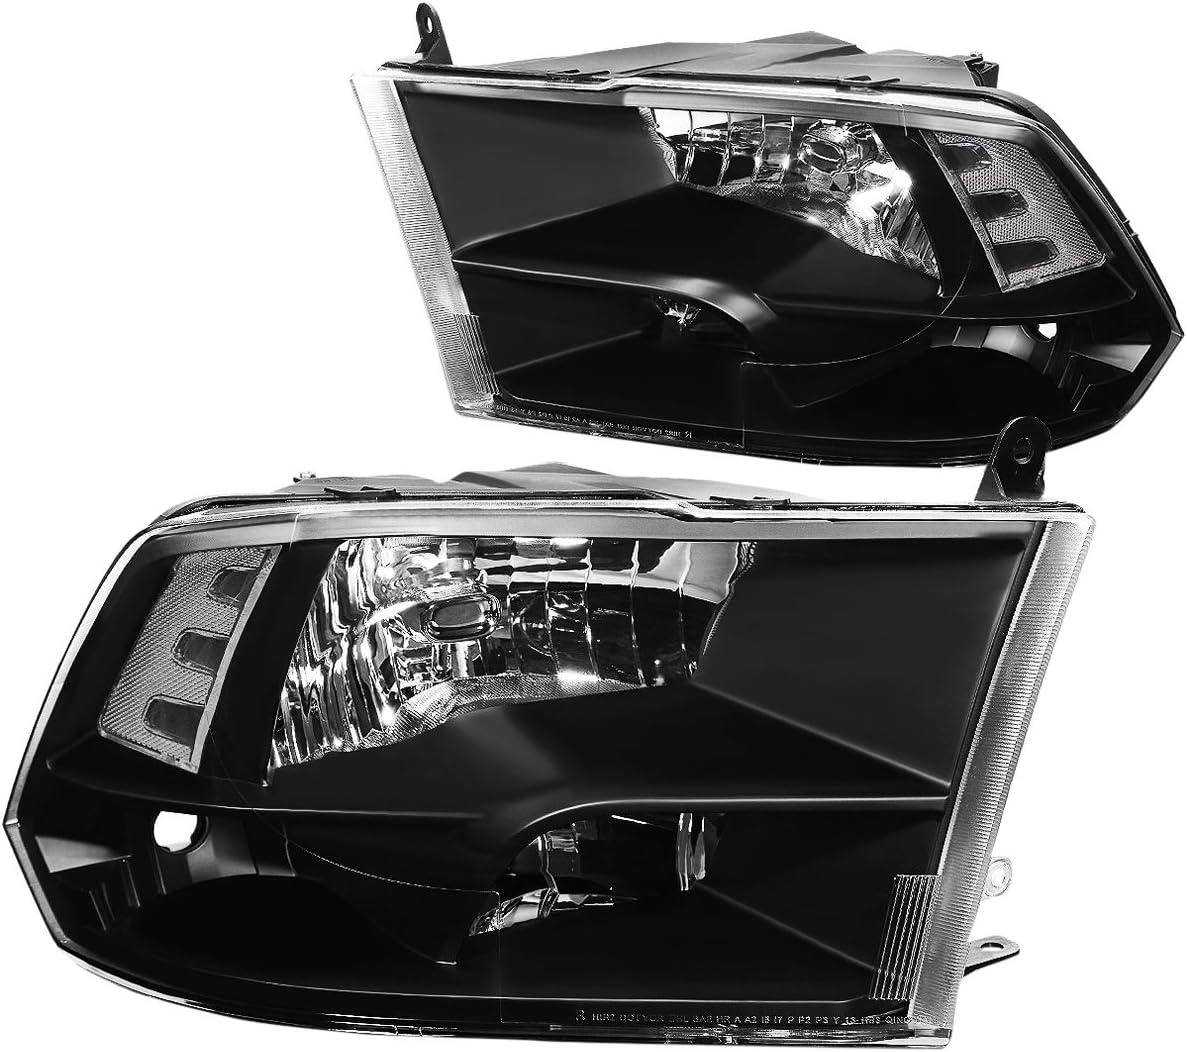 DNA Motoring HL-OH-DR09QUA-BK-CL1 Headlight Assembly (Driver and Passenger Side),Black clear